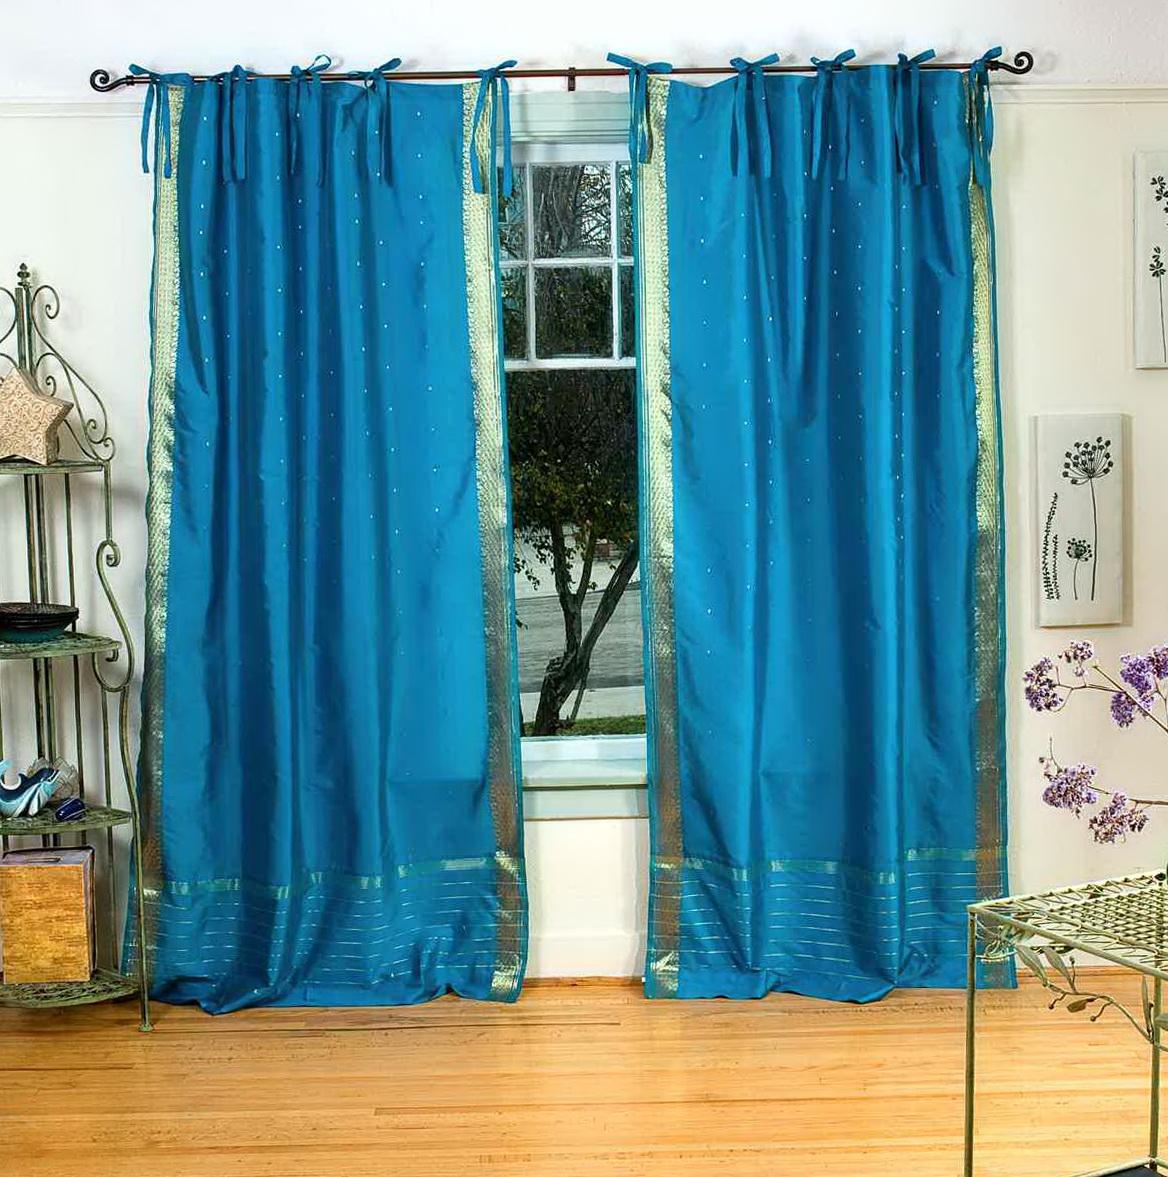 cheap curtains for sale in johannesburg home design ideas